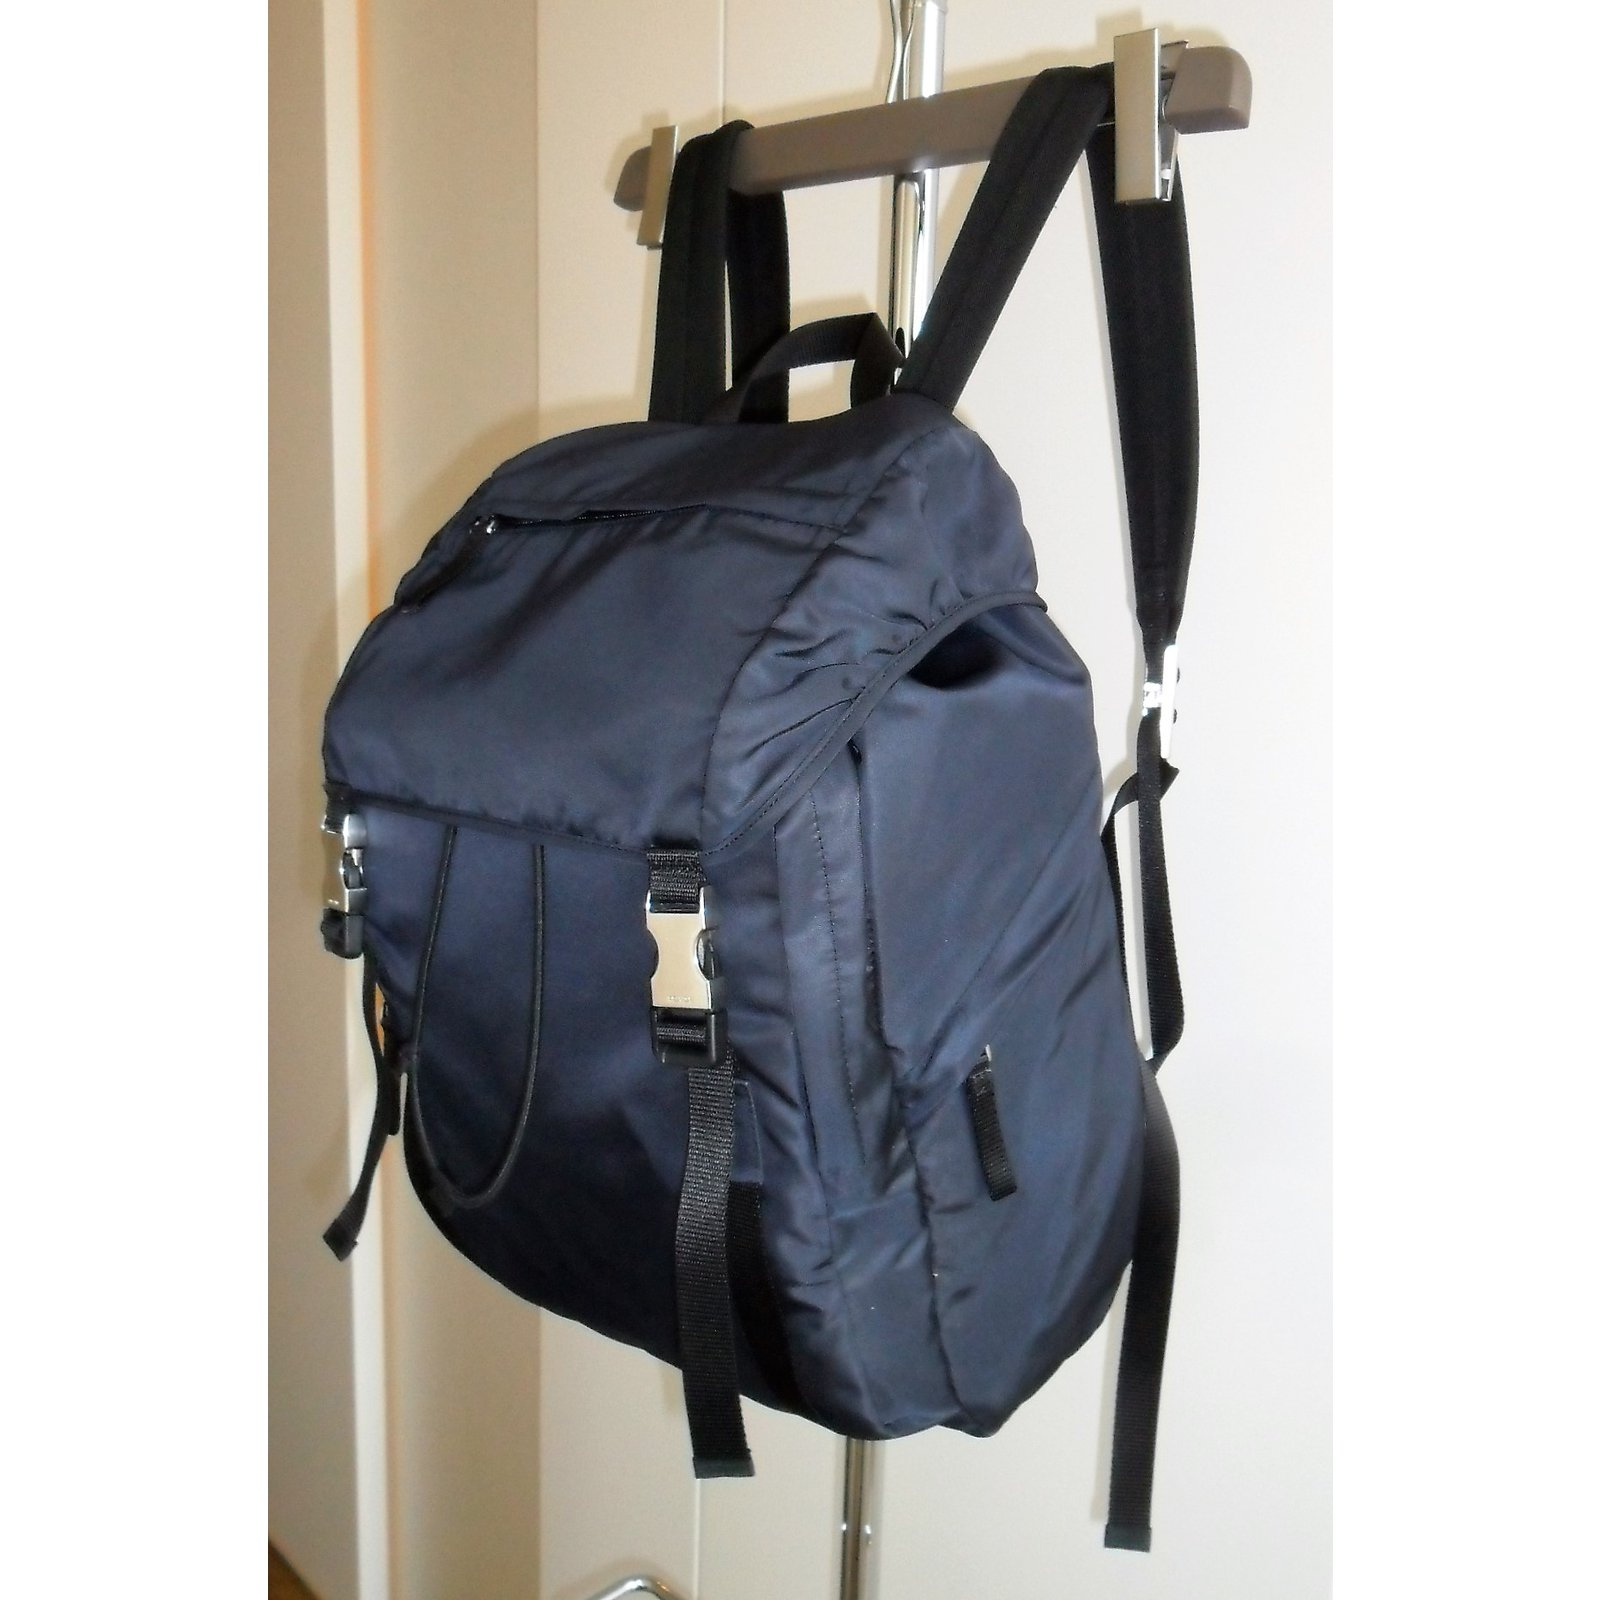 f62dbbbded55 Prada PRADA NYLON BACKPACK GREAT CONDITIONS Bags Briefcases Nylon Blue  ref.57123 - Joli Closet